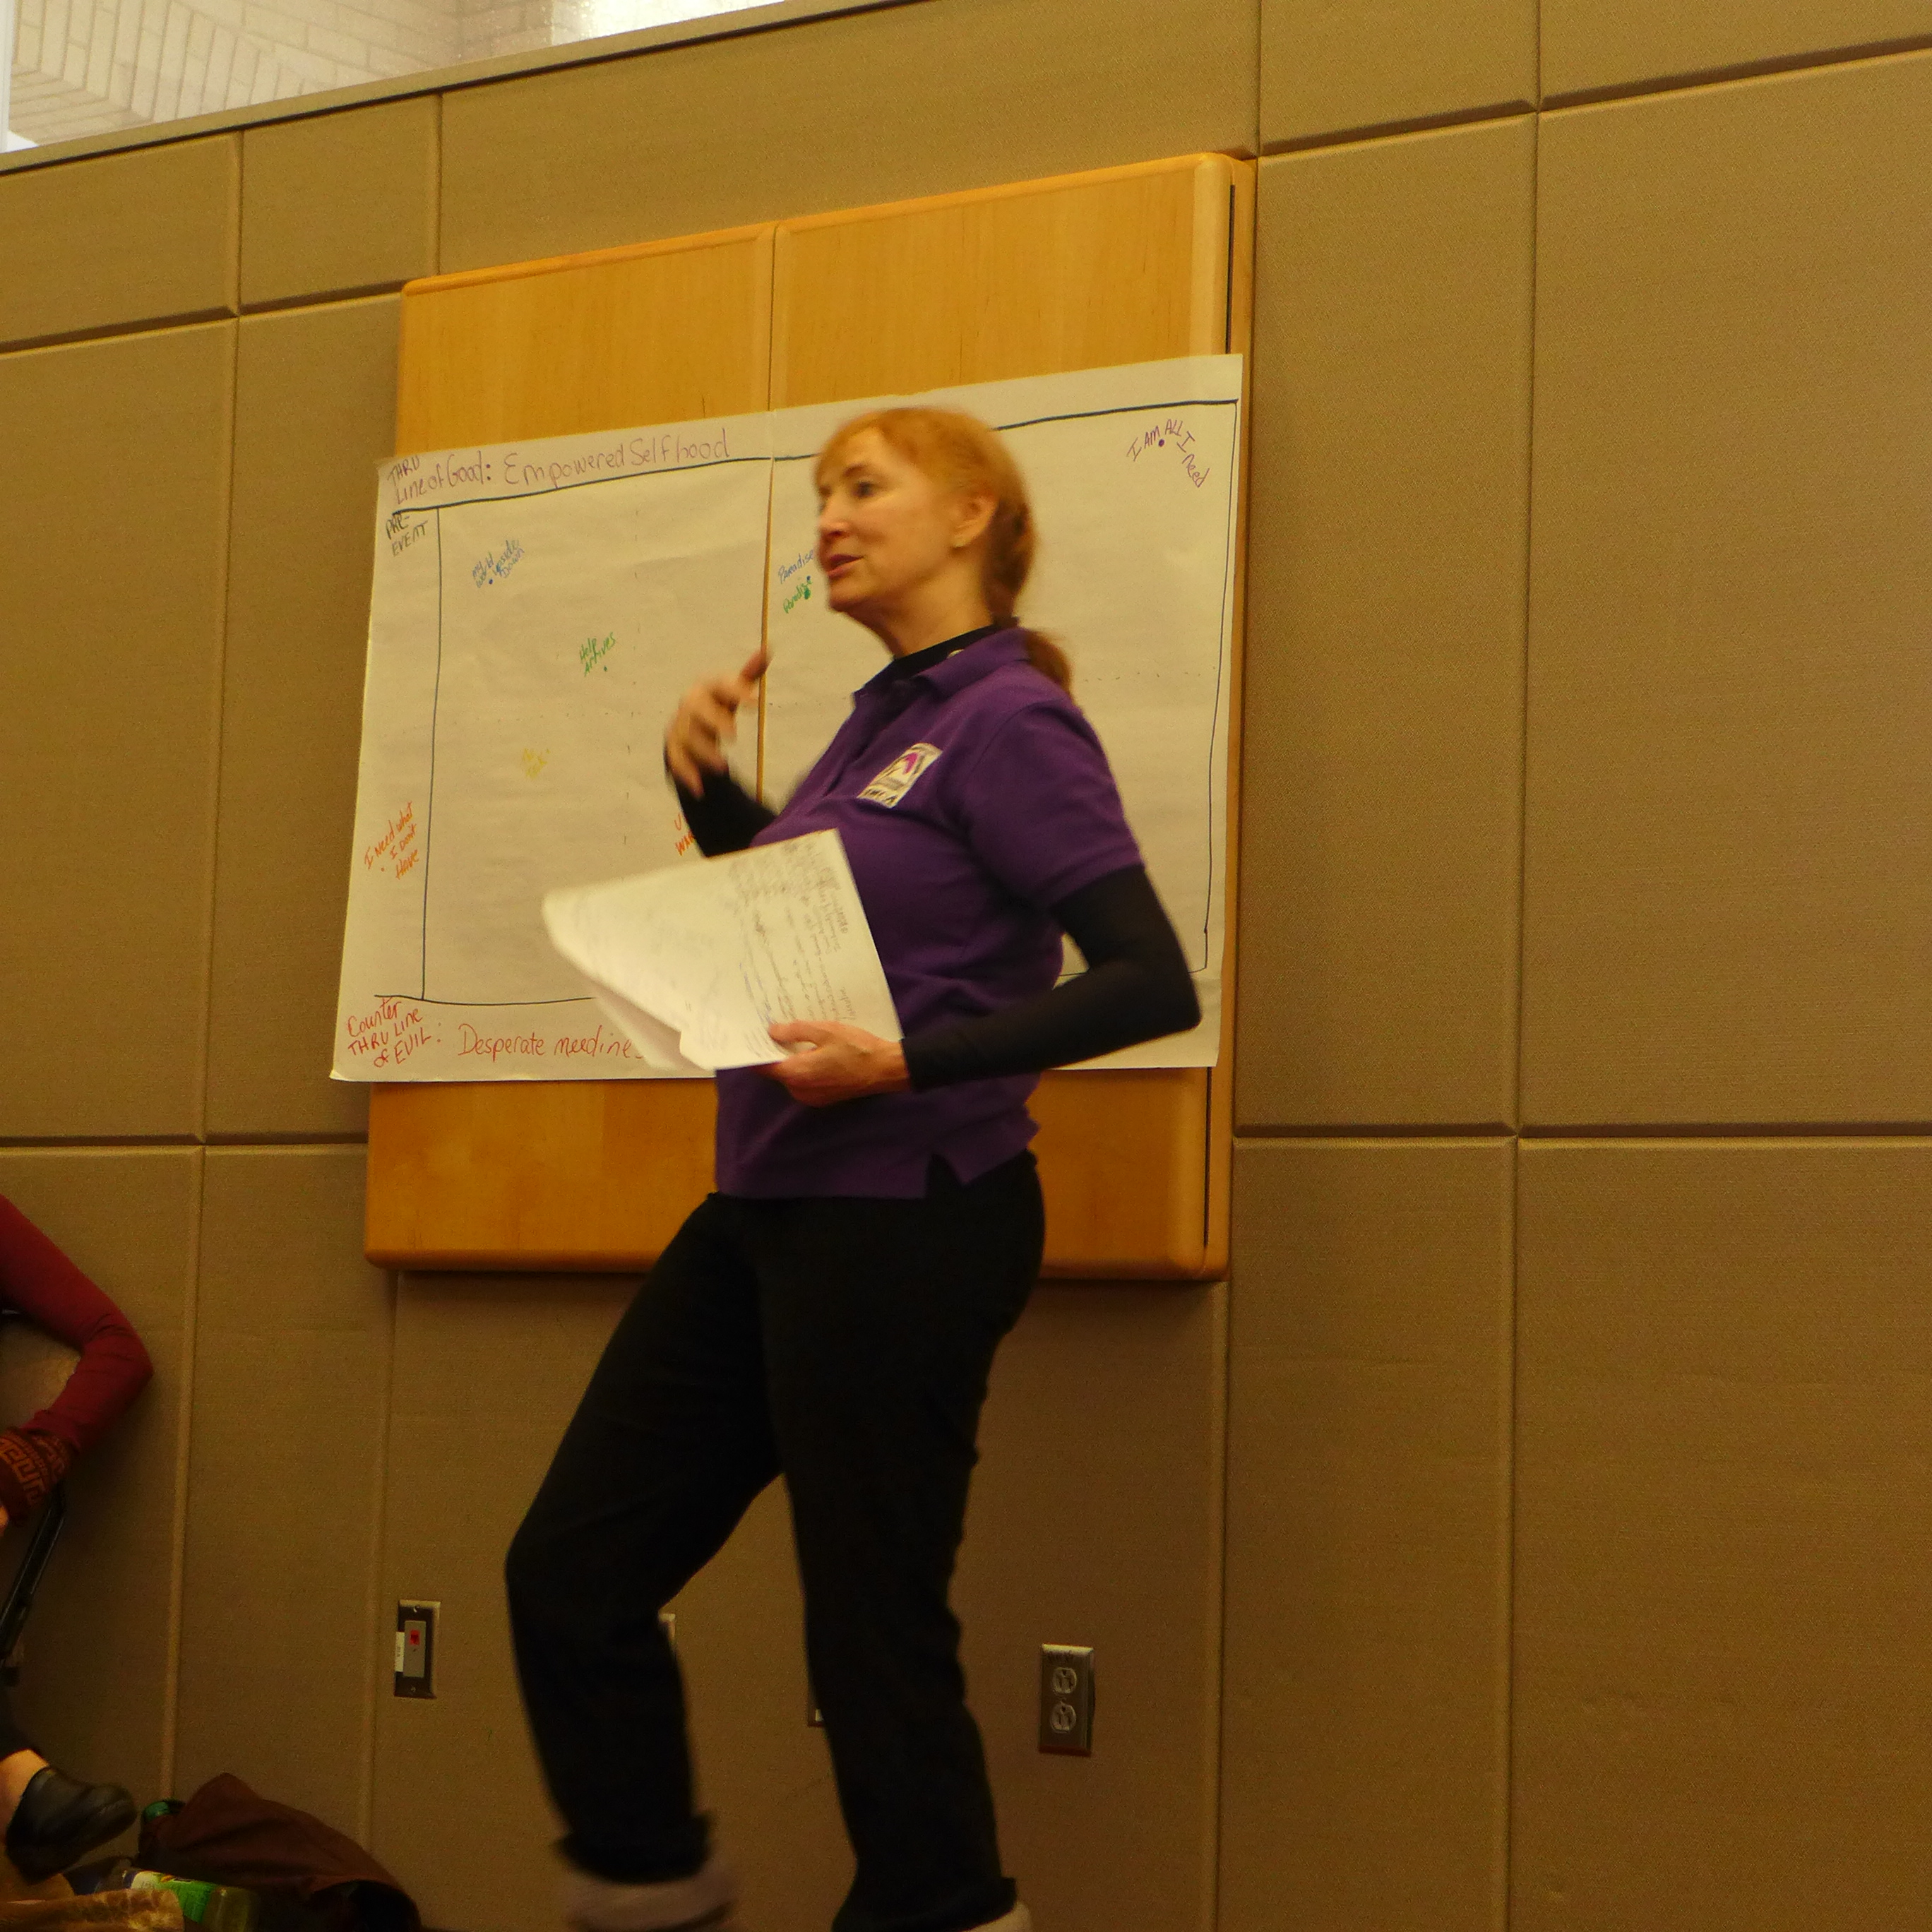 Michael Chekhov Master Teacher Lisa Dalton explains SynthAnalysis at SETC